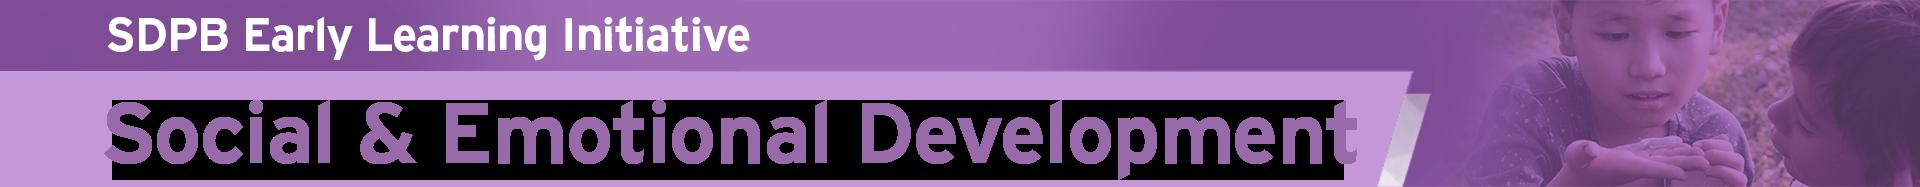 SDPB ELI Social & Emotional Development